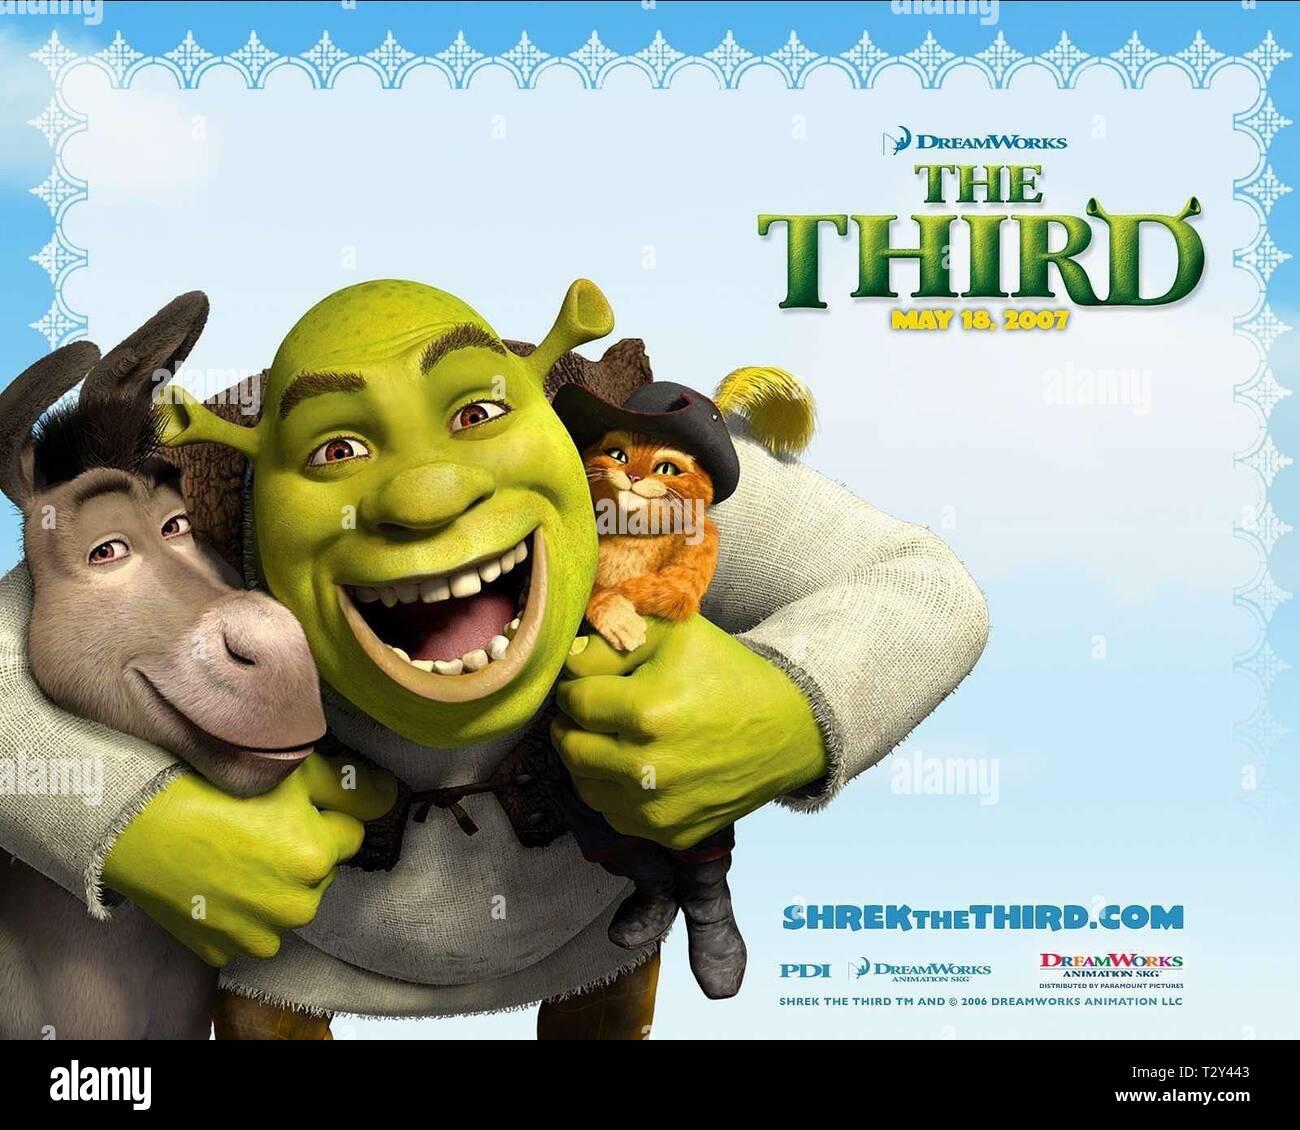 Donkey Shrek Puss In Boots Poster Shrek The Third 2007 Stock Photo Alamy